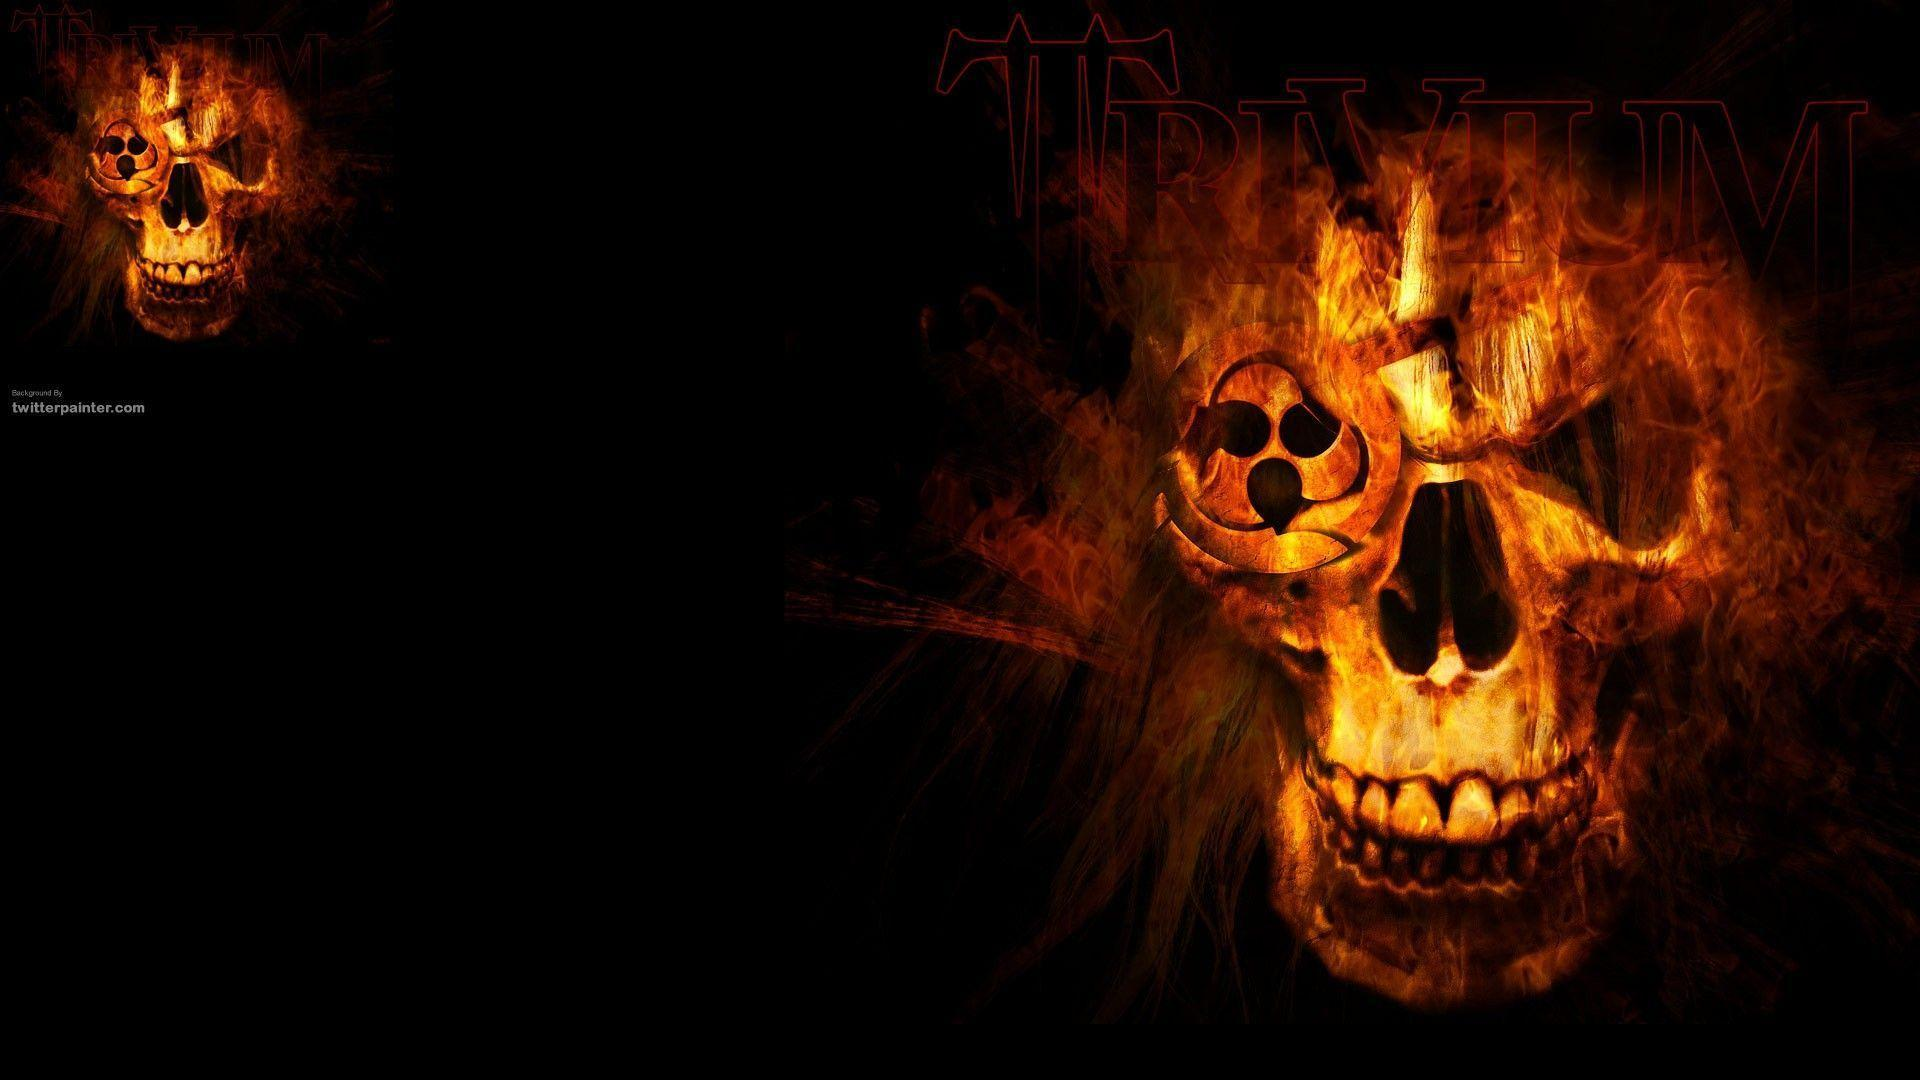 Royalty Free Stock Illustration of Skull Fire Wallpaper D